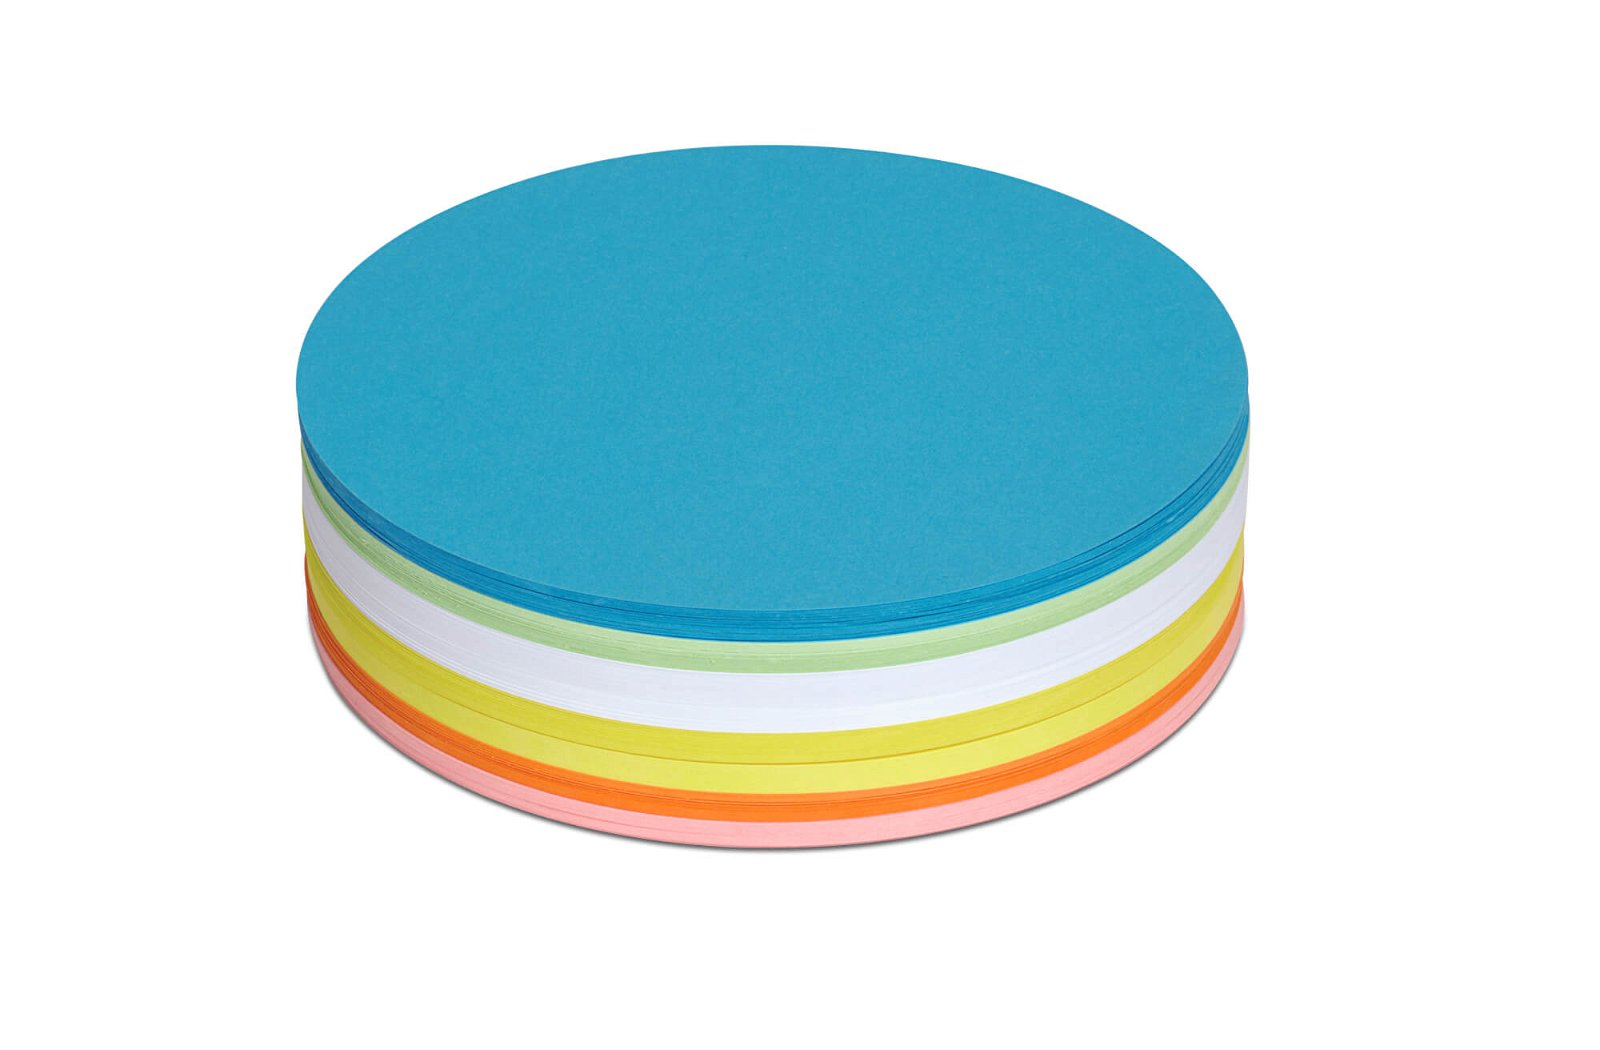 Moderationskarten rund, Ø 18,5 cm, 250 St./Pack, farbig sortiert